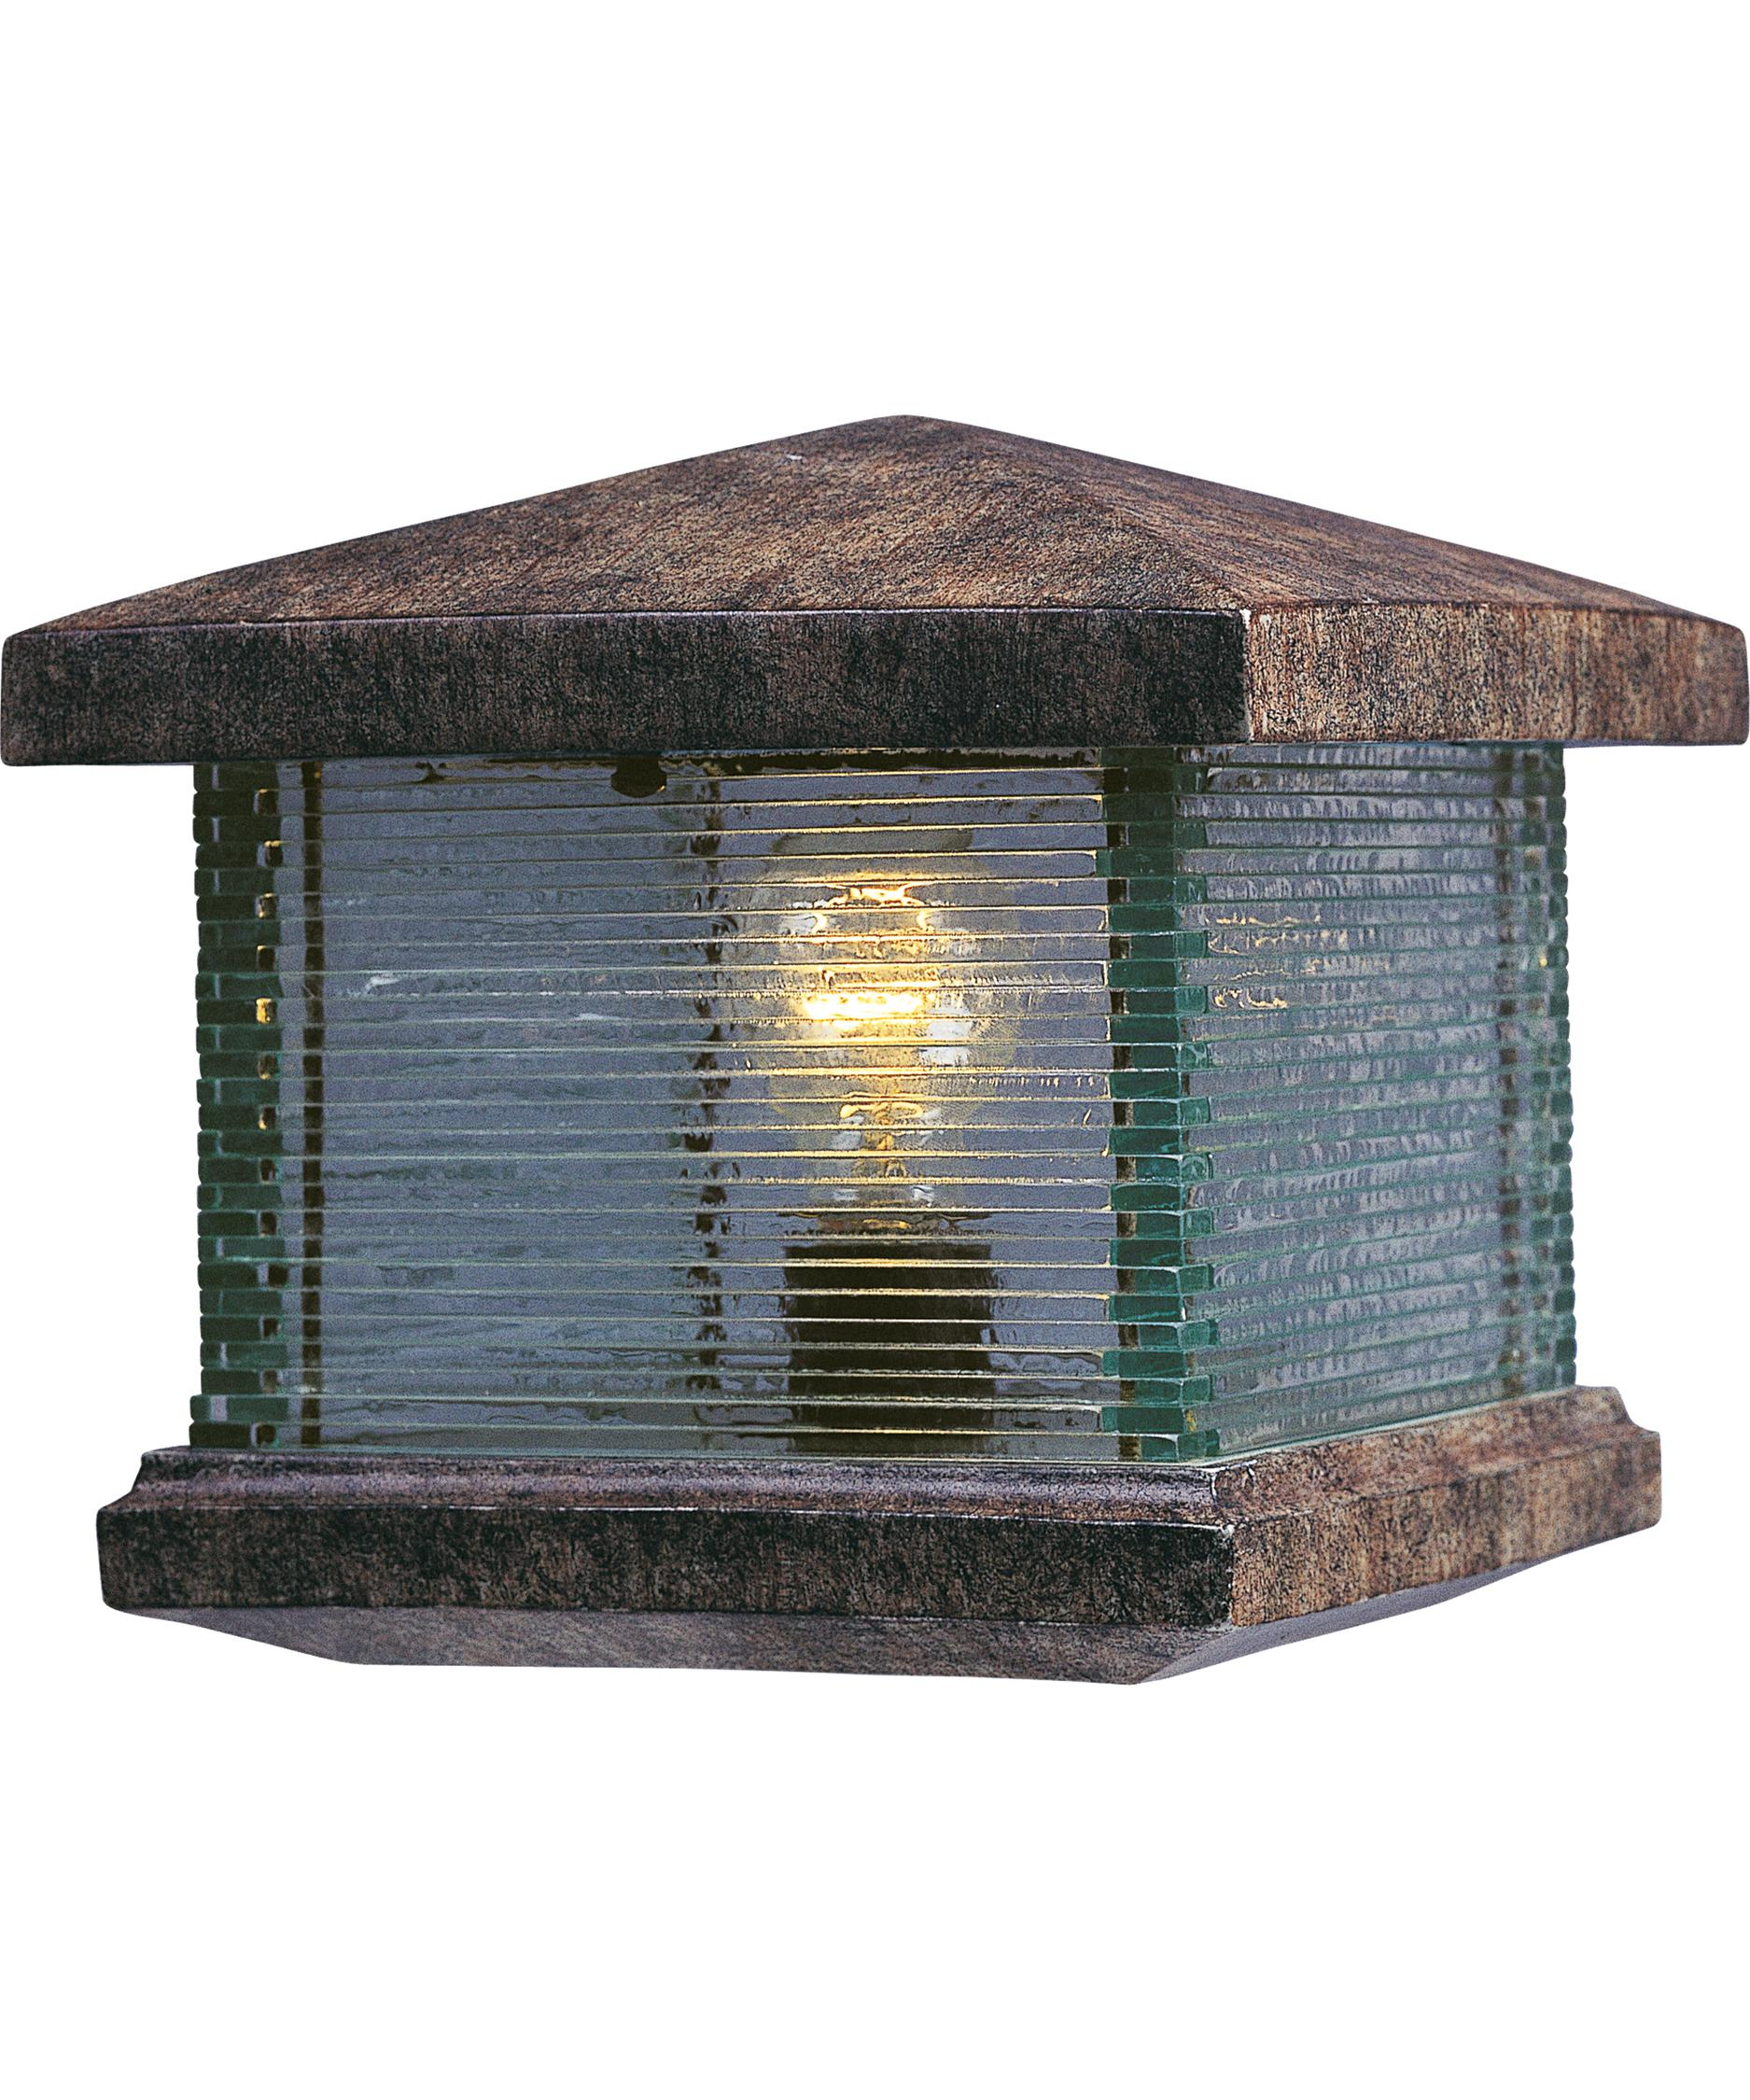 Maxim Lighting 48736 Triumph VX 1 Light Outdoor Pier Lamp | Capitol Lighting  1 800lighting.com